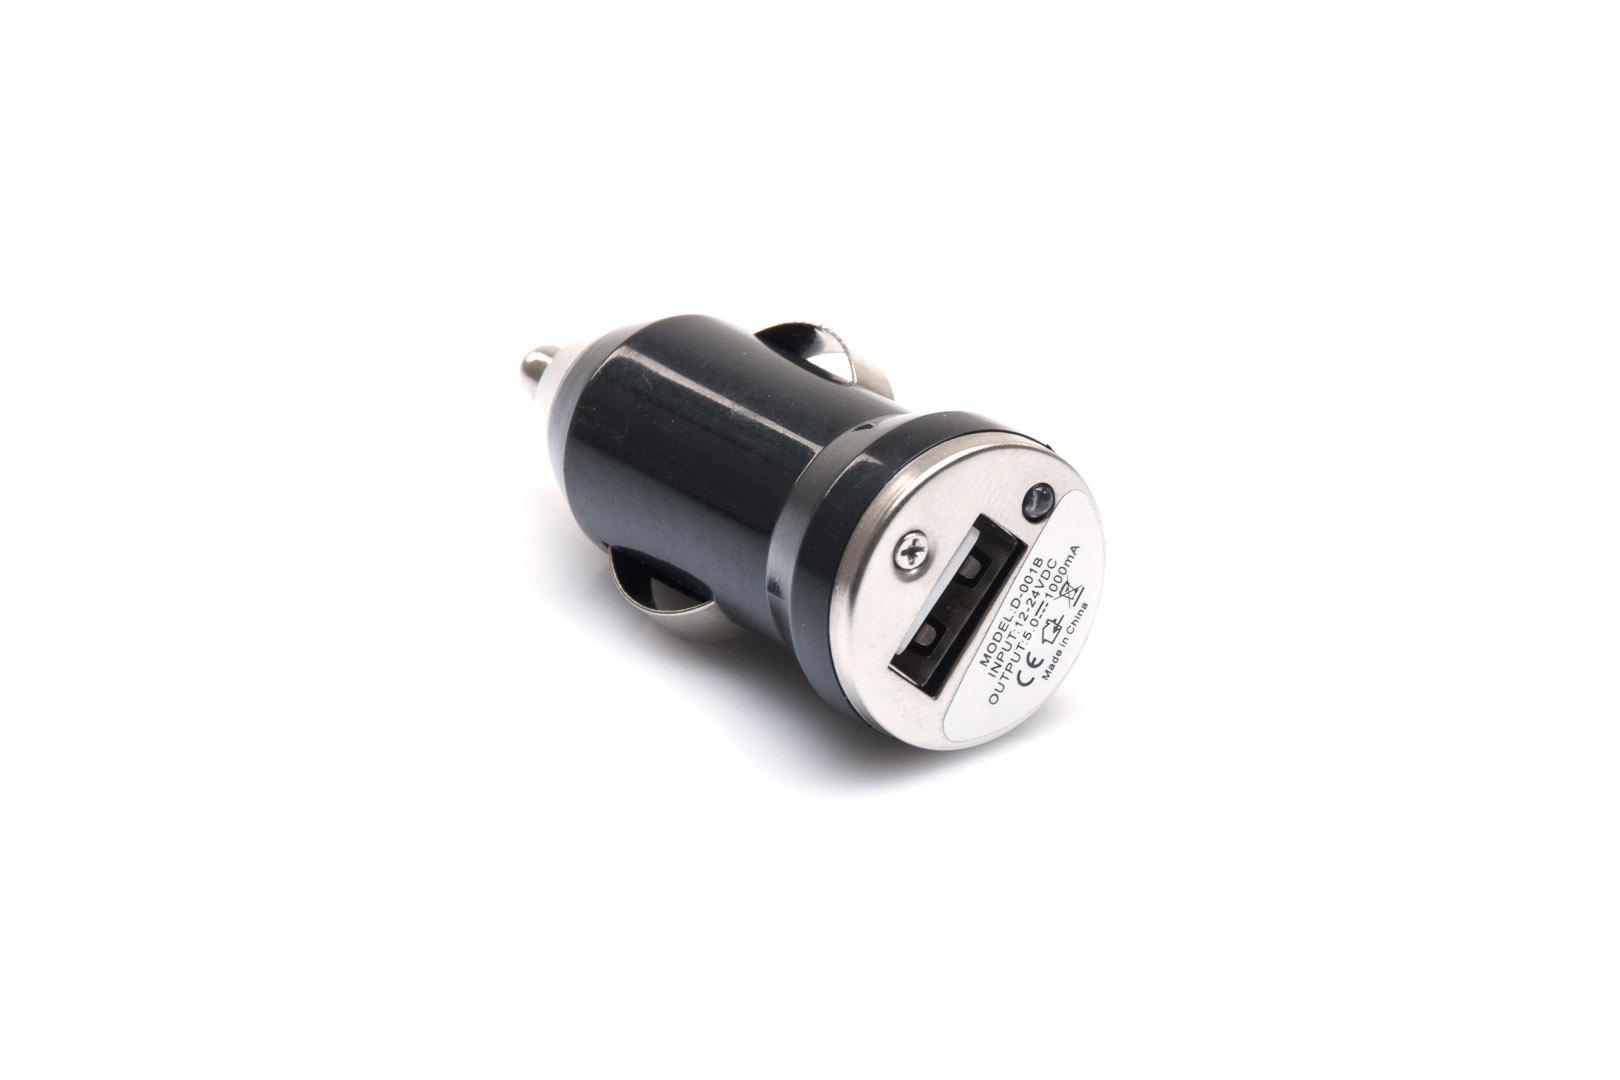 SW-Motech adapteripistoke, tupakansytytinpistoke -> USB-pistoke